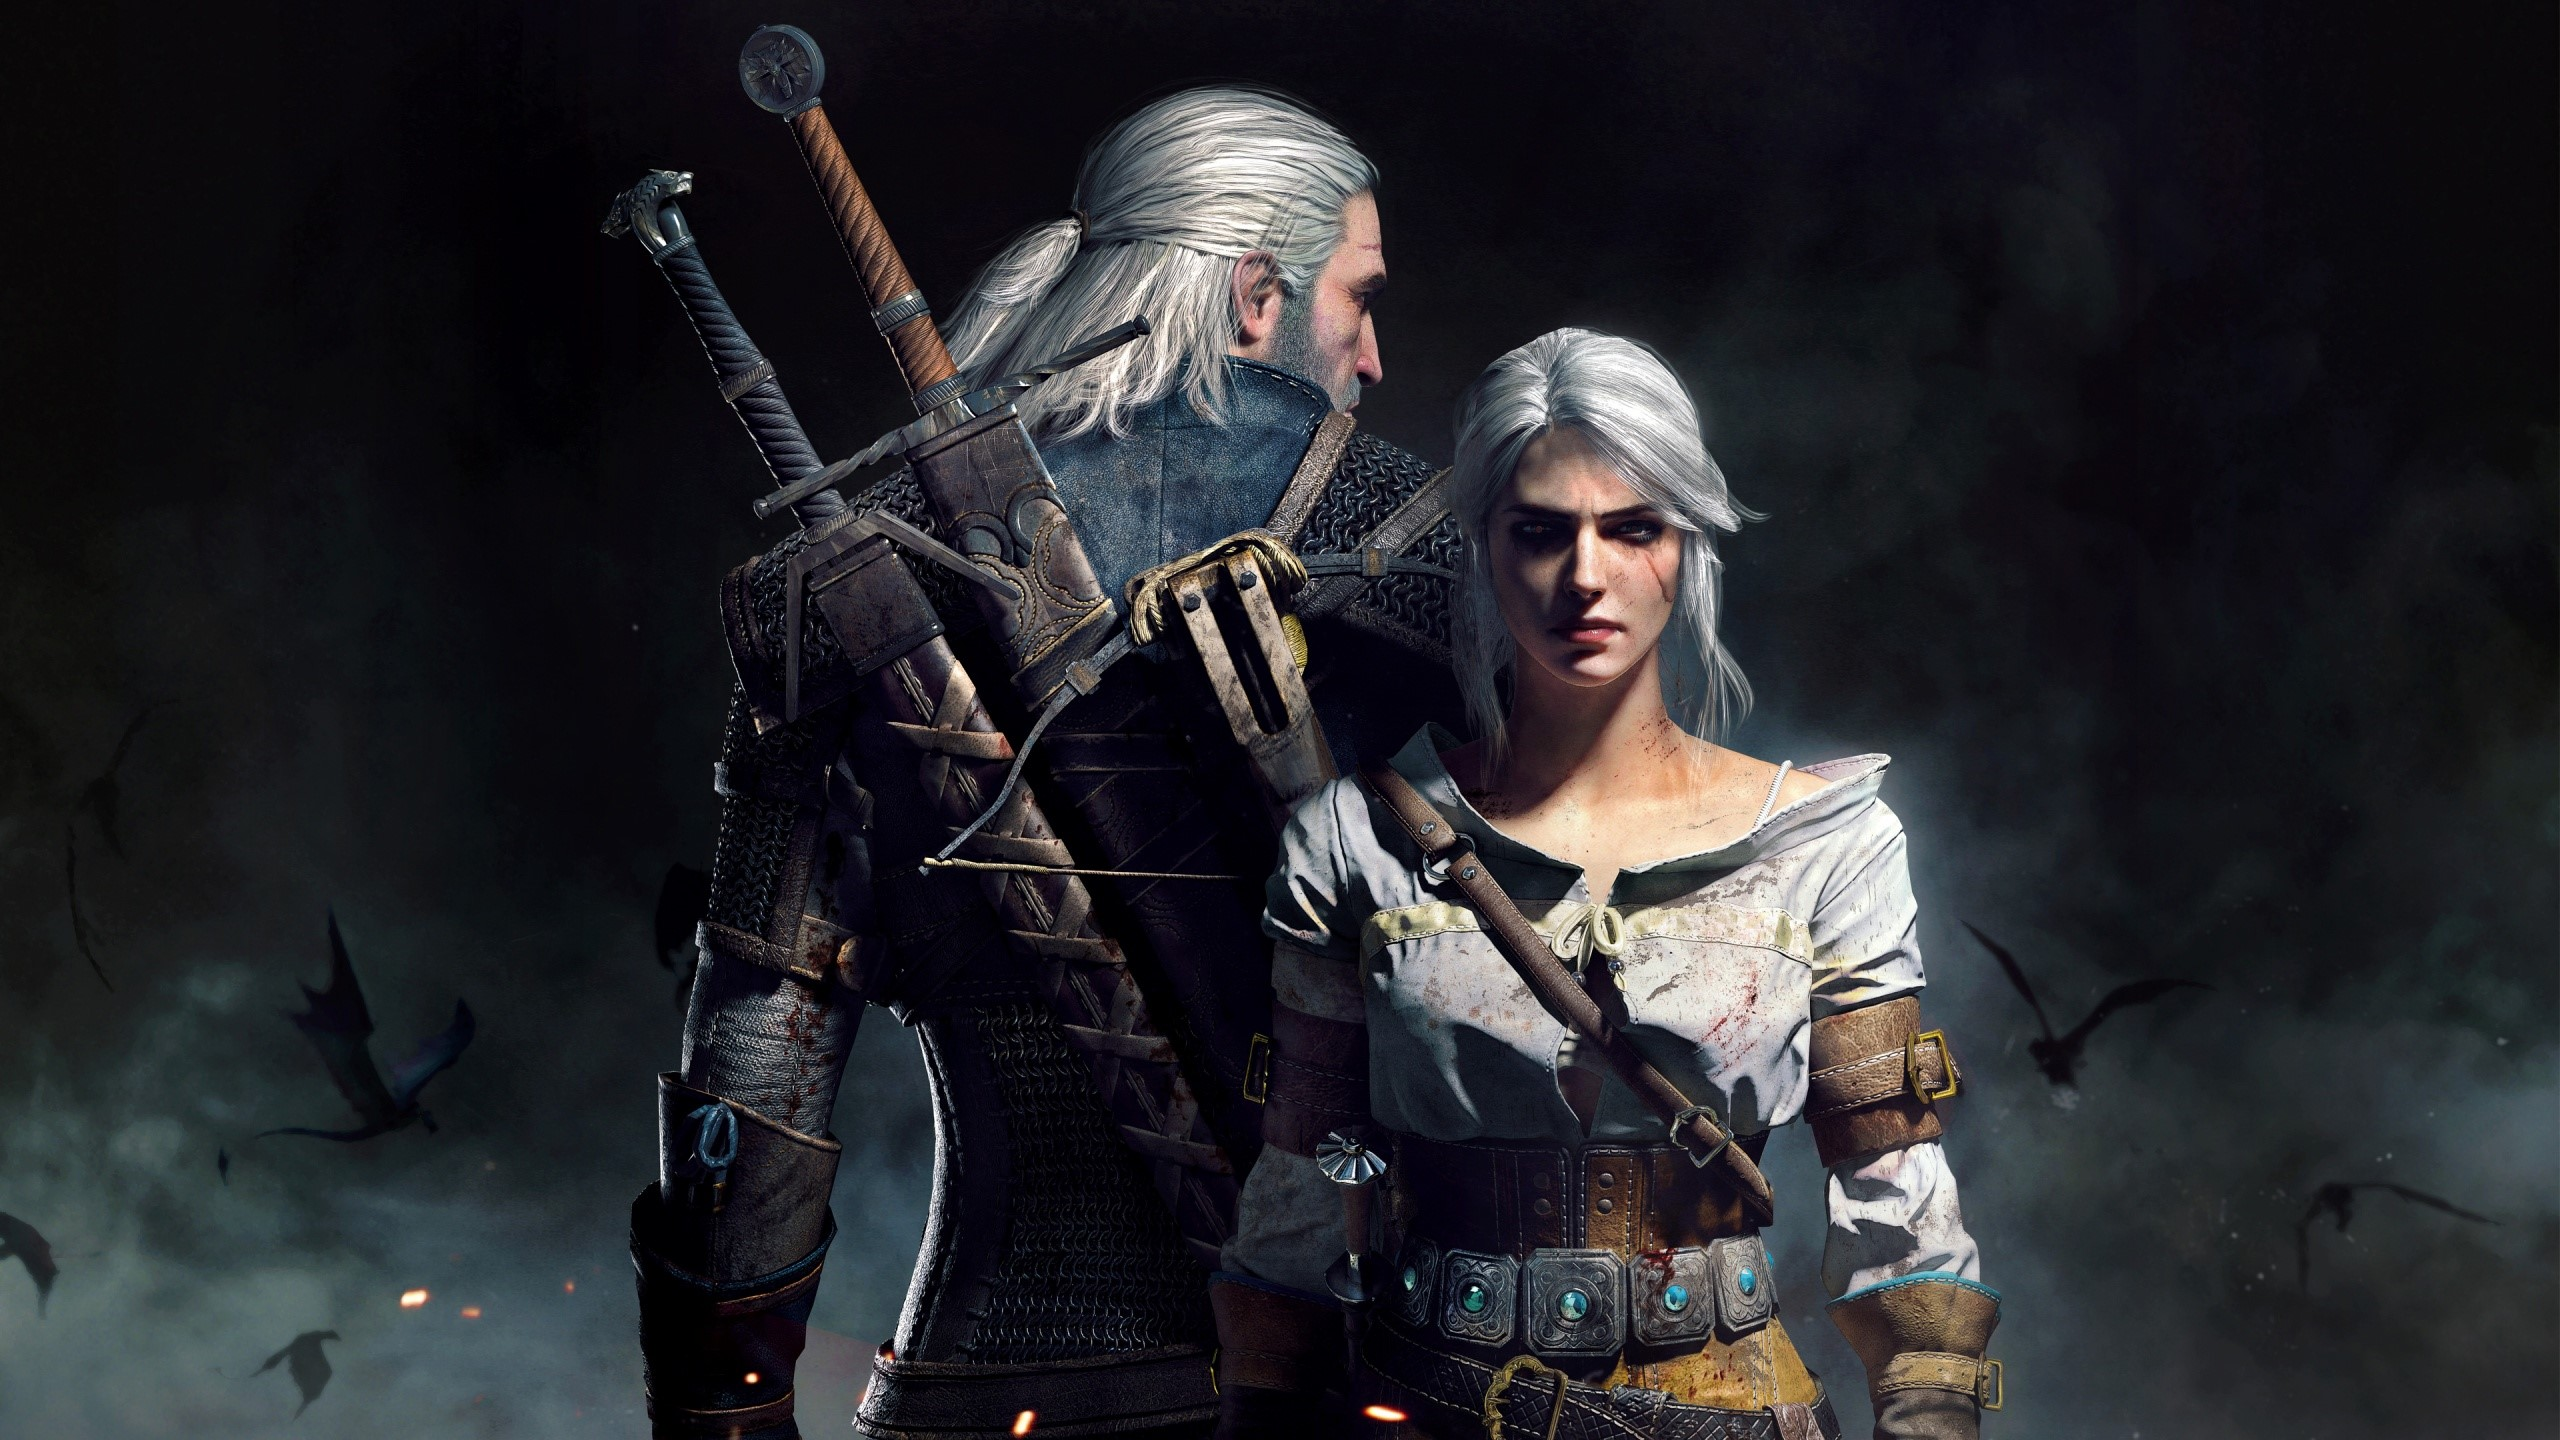 Fondos de pantalla Geralt y Ciri en The Witcher 3 Wild Hunt